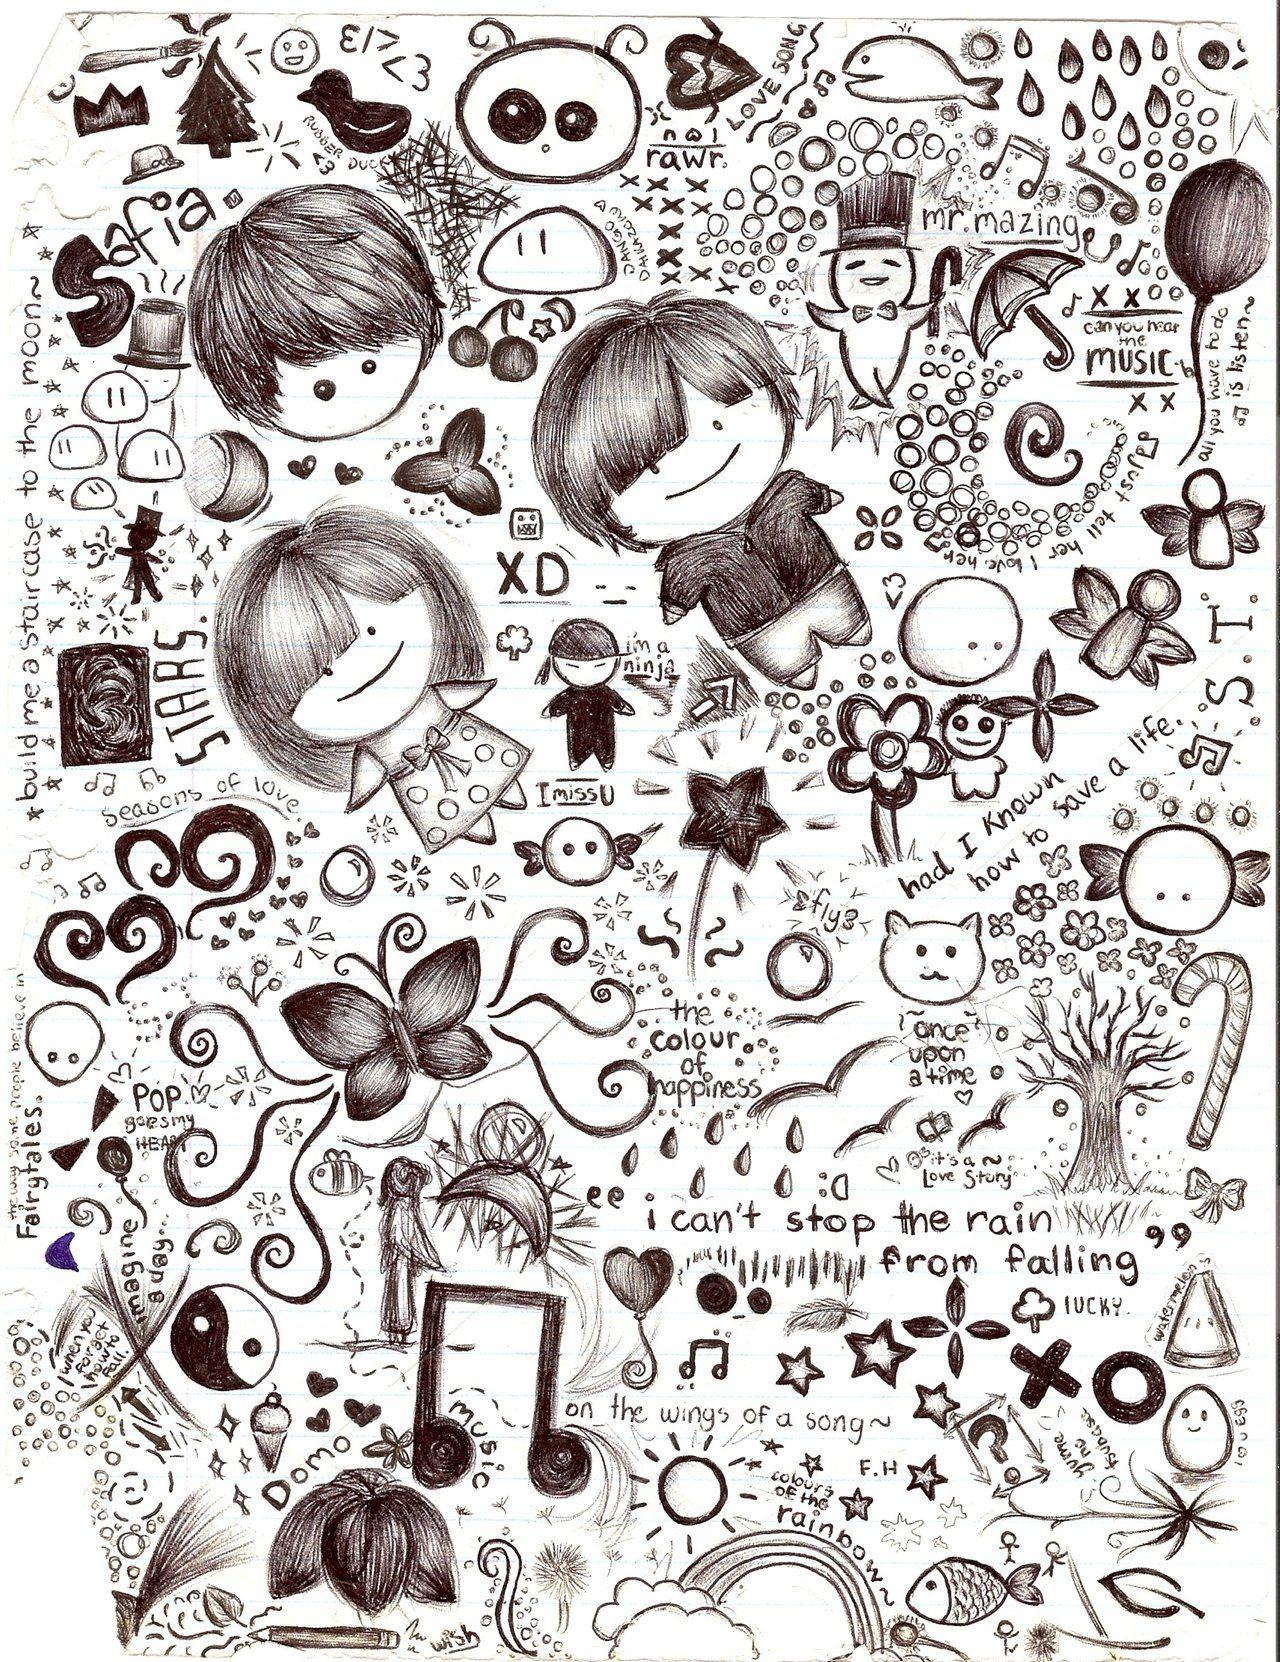 Random Drawings Doodles   sketchbooks   Pinterest   Doodle ...